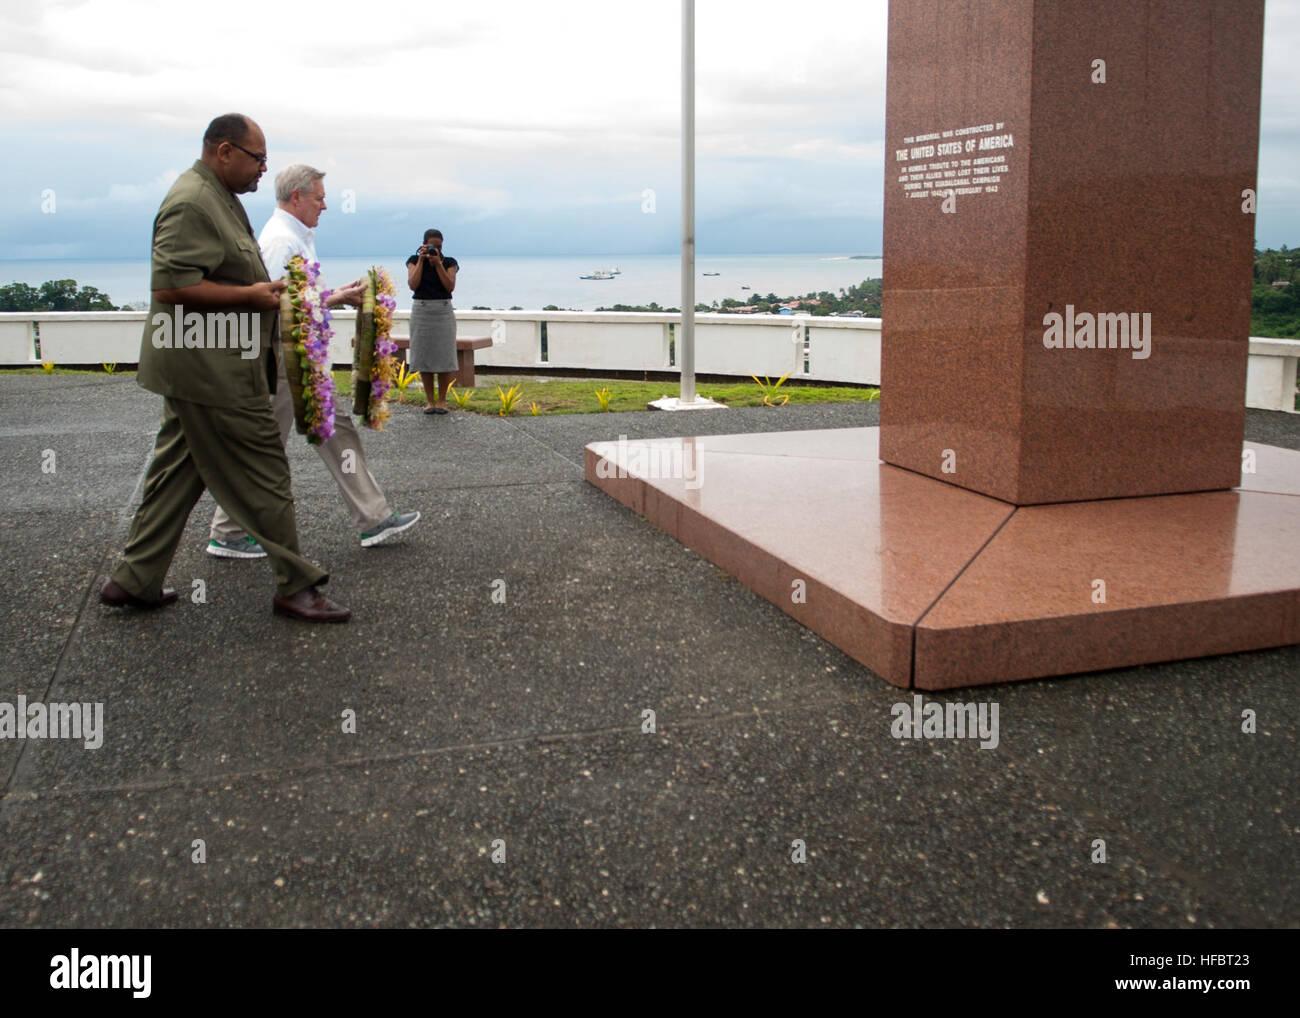 120330-N-AC887-002 HONIARA, Solomon Islands (March 30, 2012) Secretary of the Navy (SECNAV) Ray Mabus and U.S. Ambassador - Stock Image